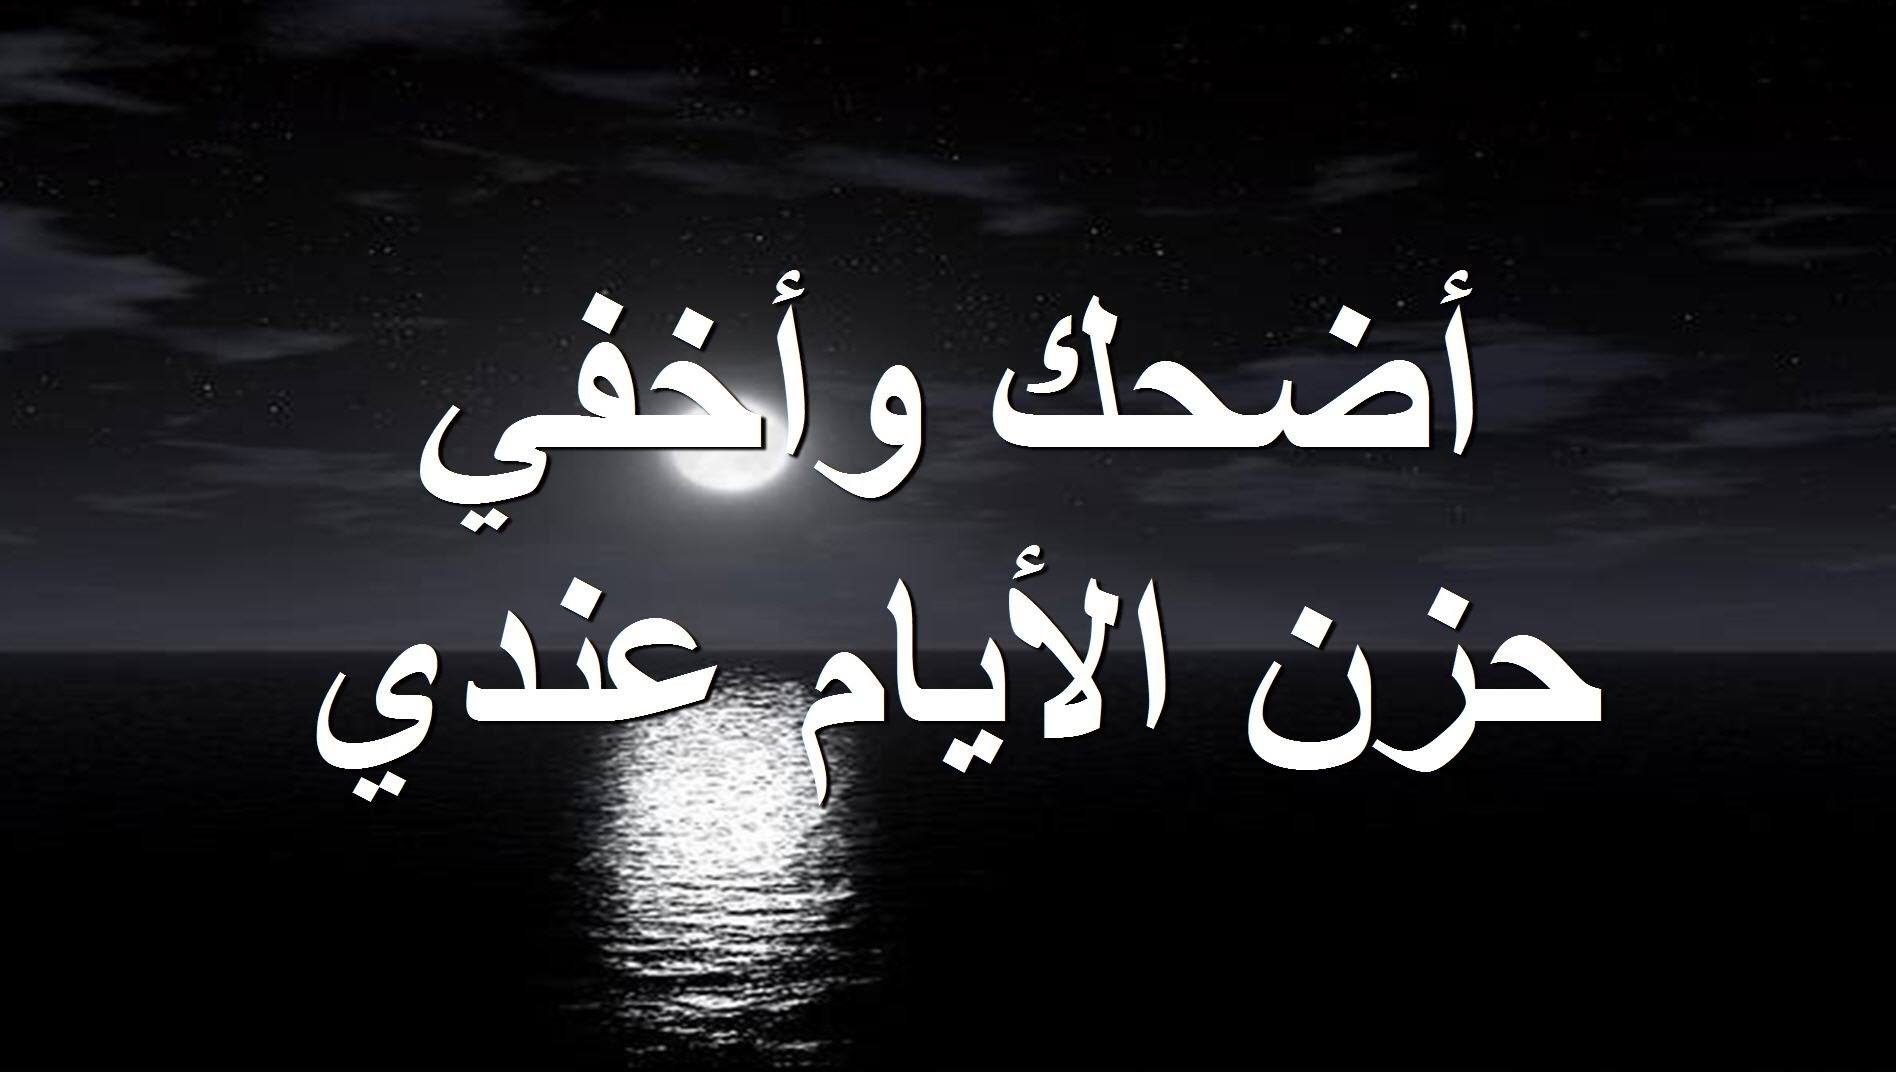 بالصور صور حزن وفراق , صور معبره عن الالم والحزن 4457 8